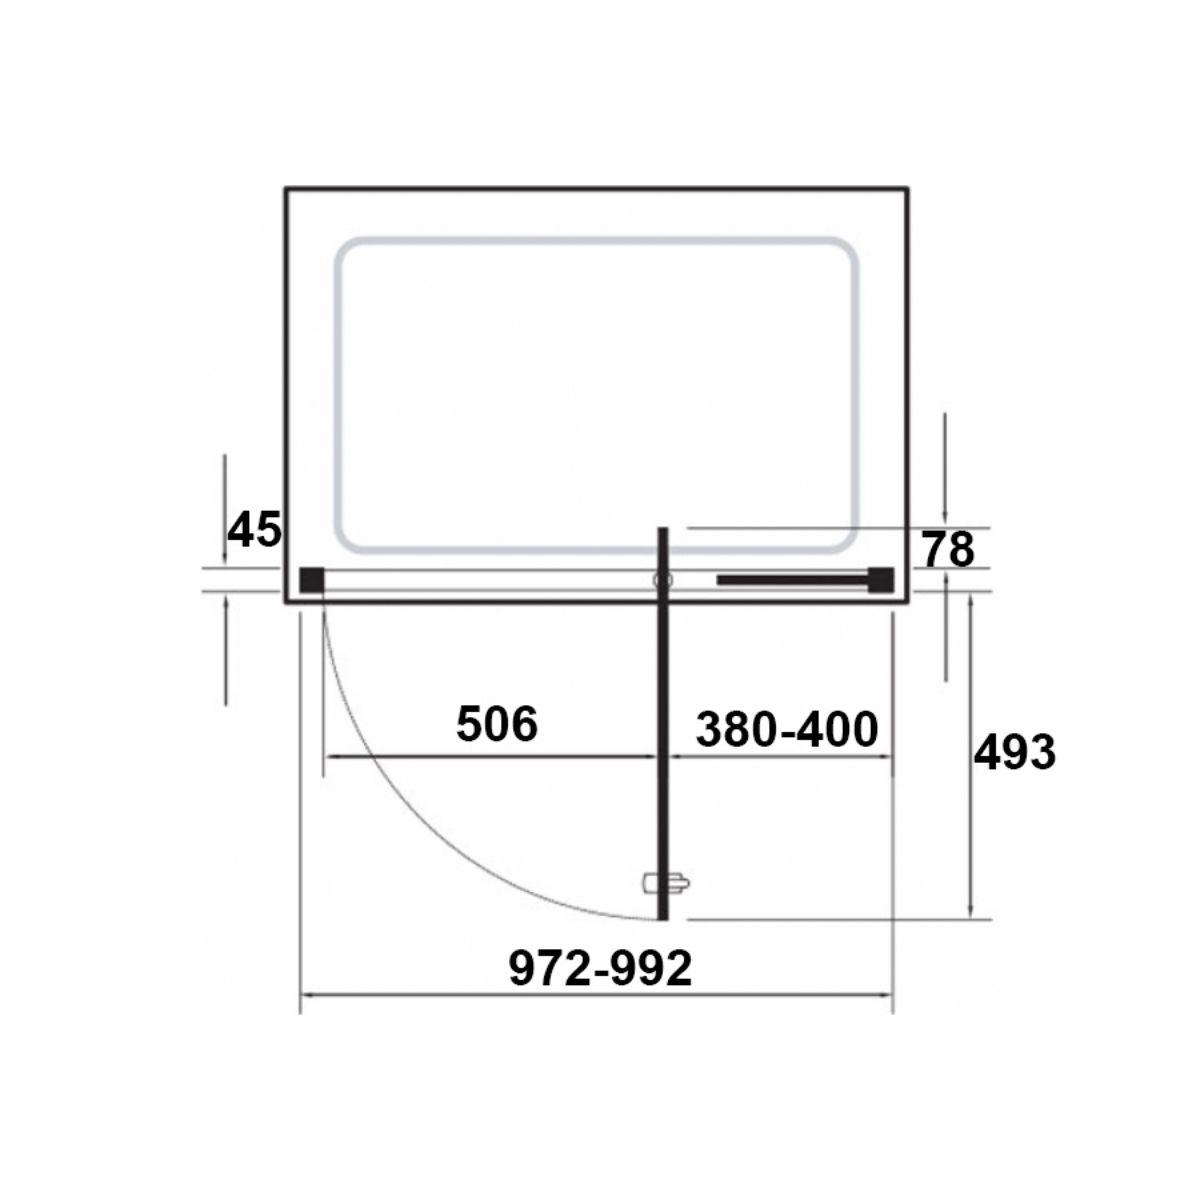 kudosoriginalstraightpivotshowerenclosure1000x700dimensions